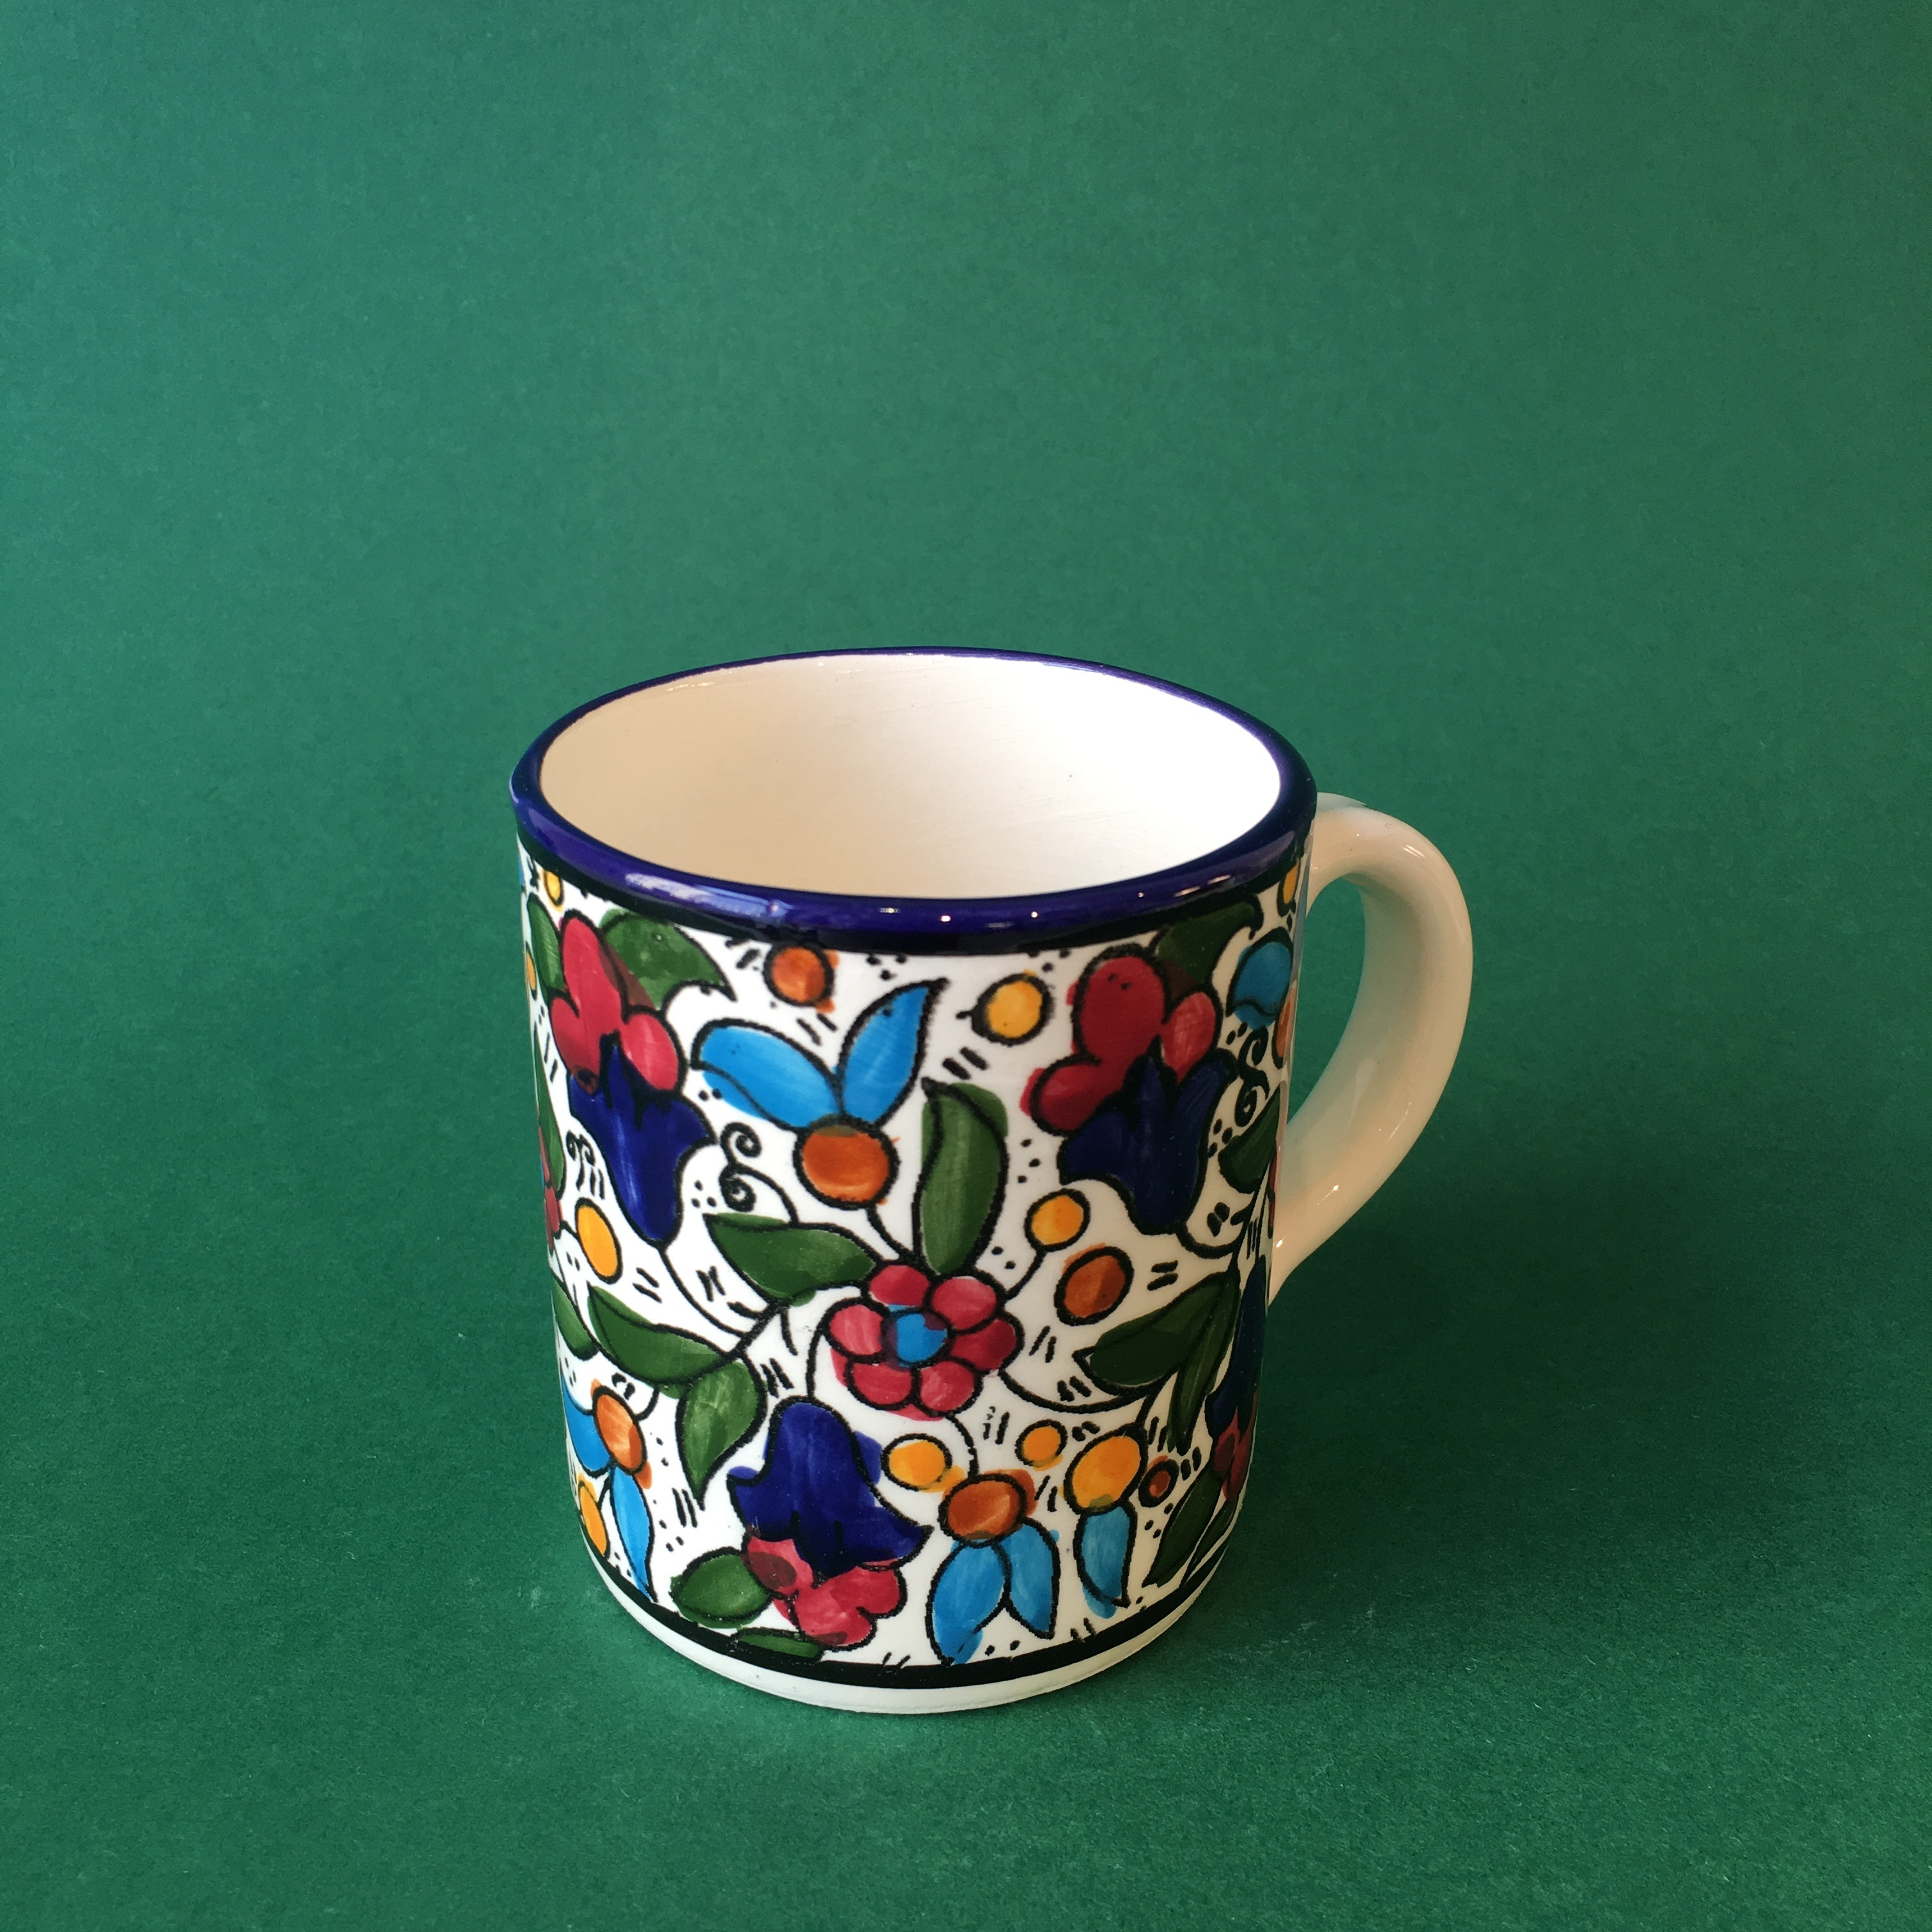 Mellomstor keramikkopp, flerfarget